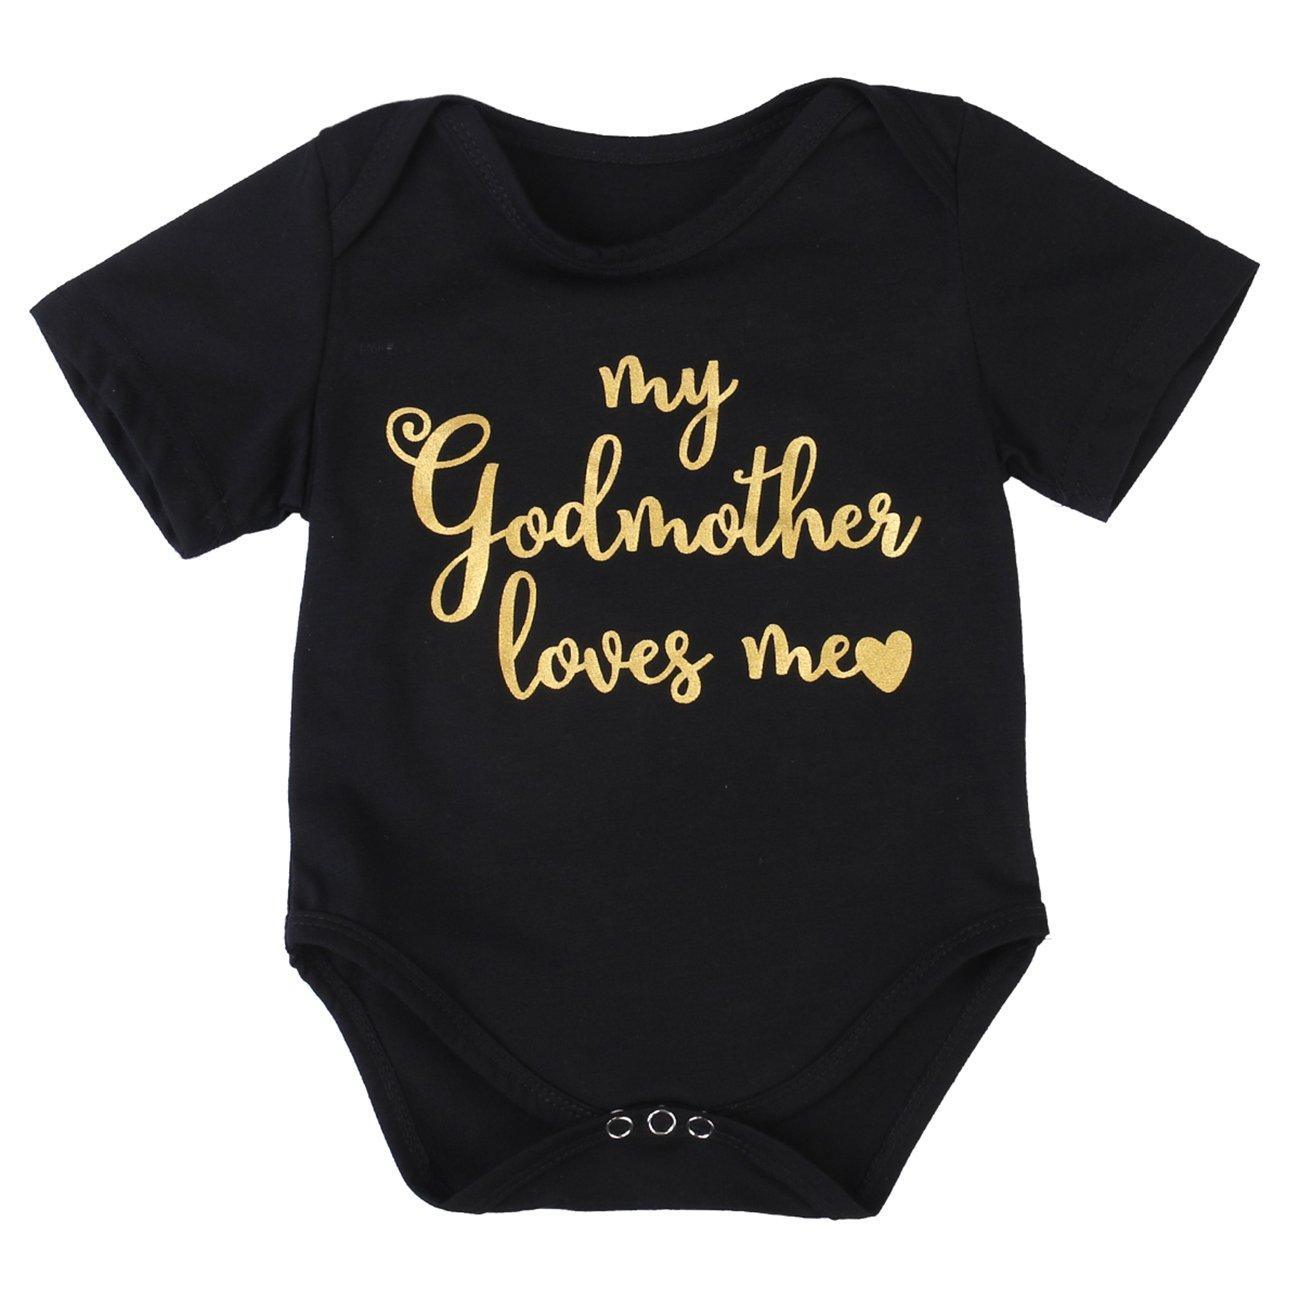 Gogoboi Cotton Baby Clothes Letter Print Short-Sleeve Bodysuit For Kid Boy Girl 0-24M (Black, 6-12 Months)